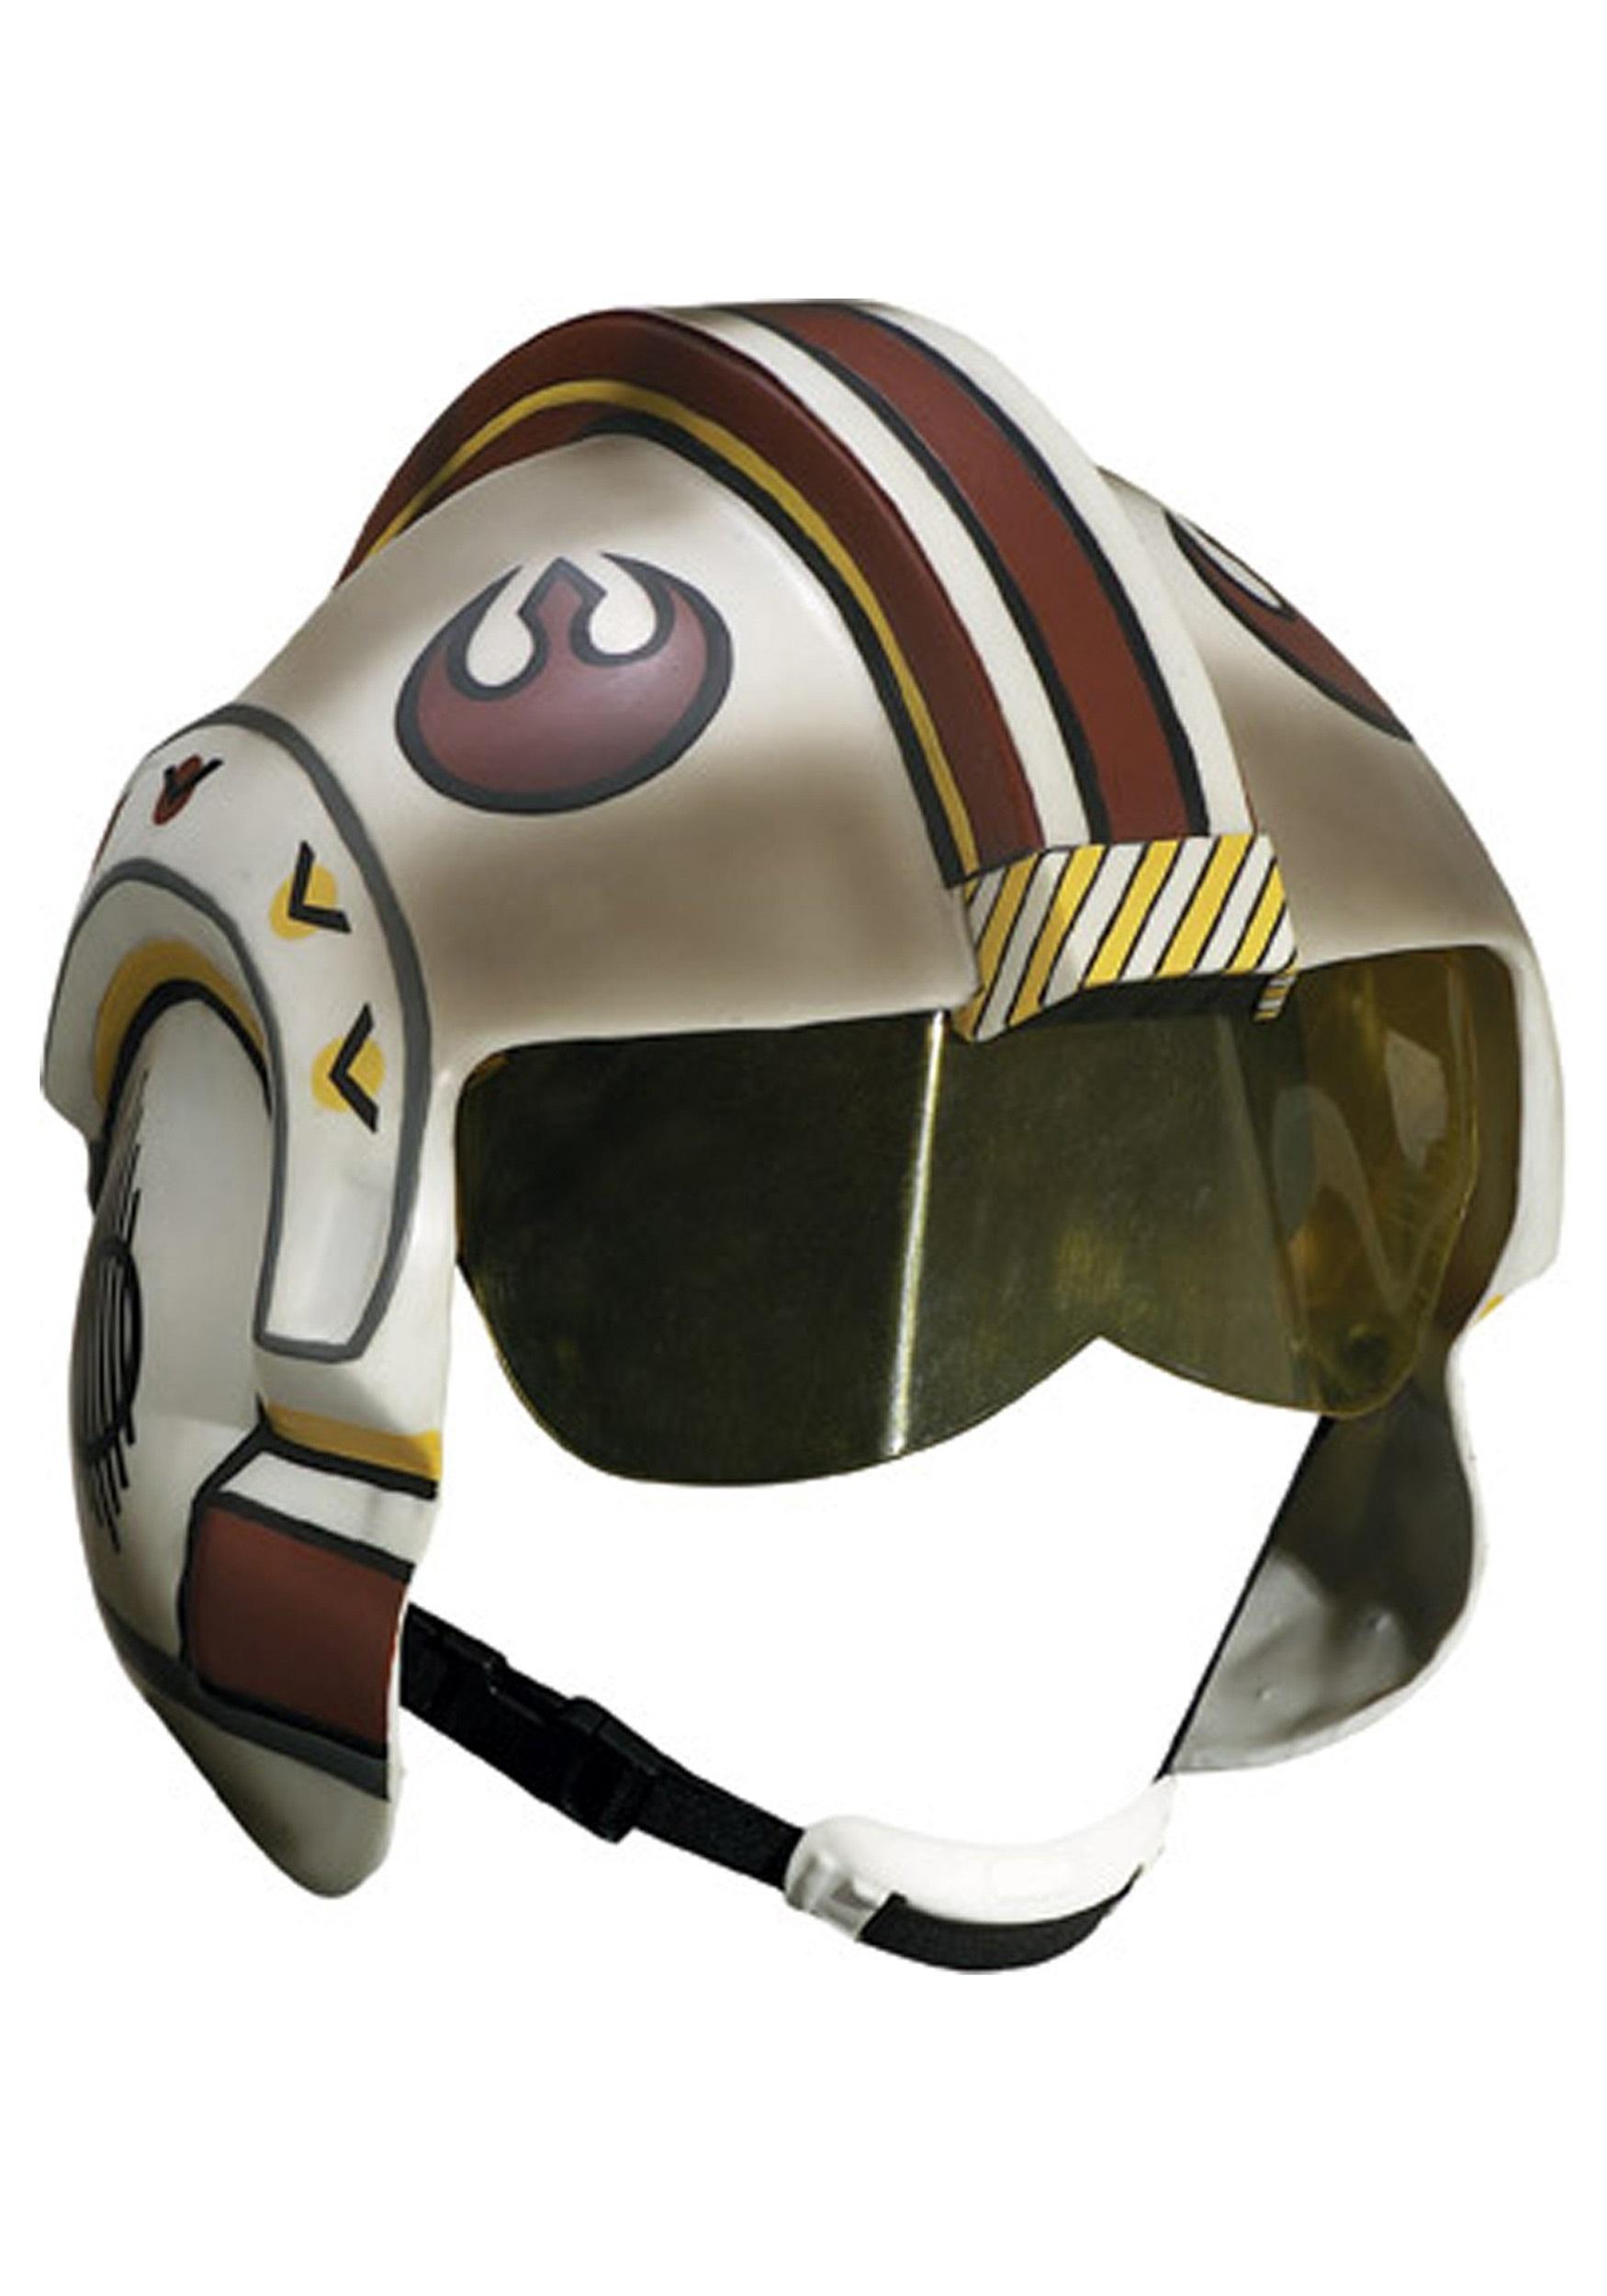 Star Wars Masks / Helmets - Star Wars Halloween Masks